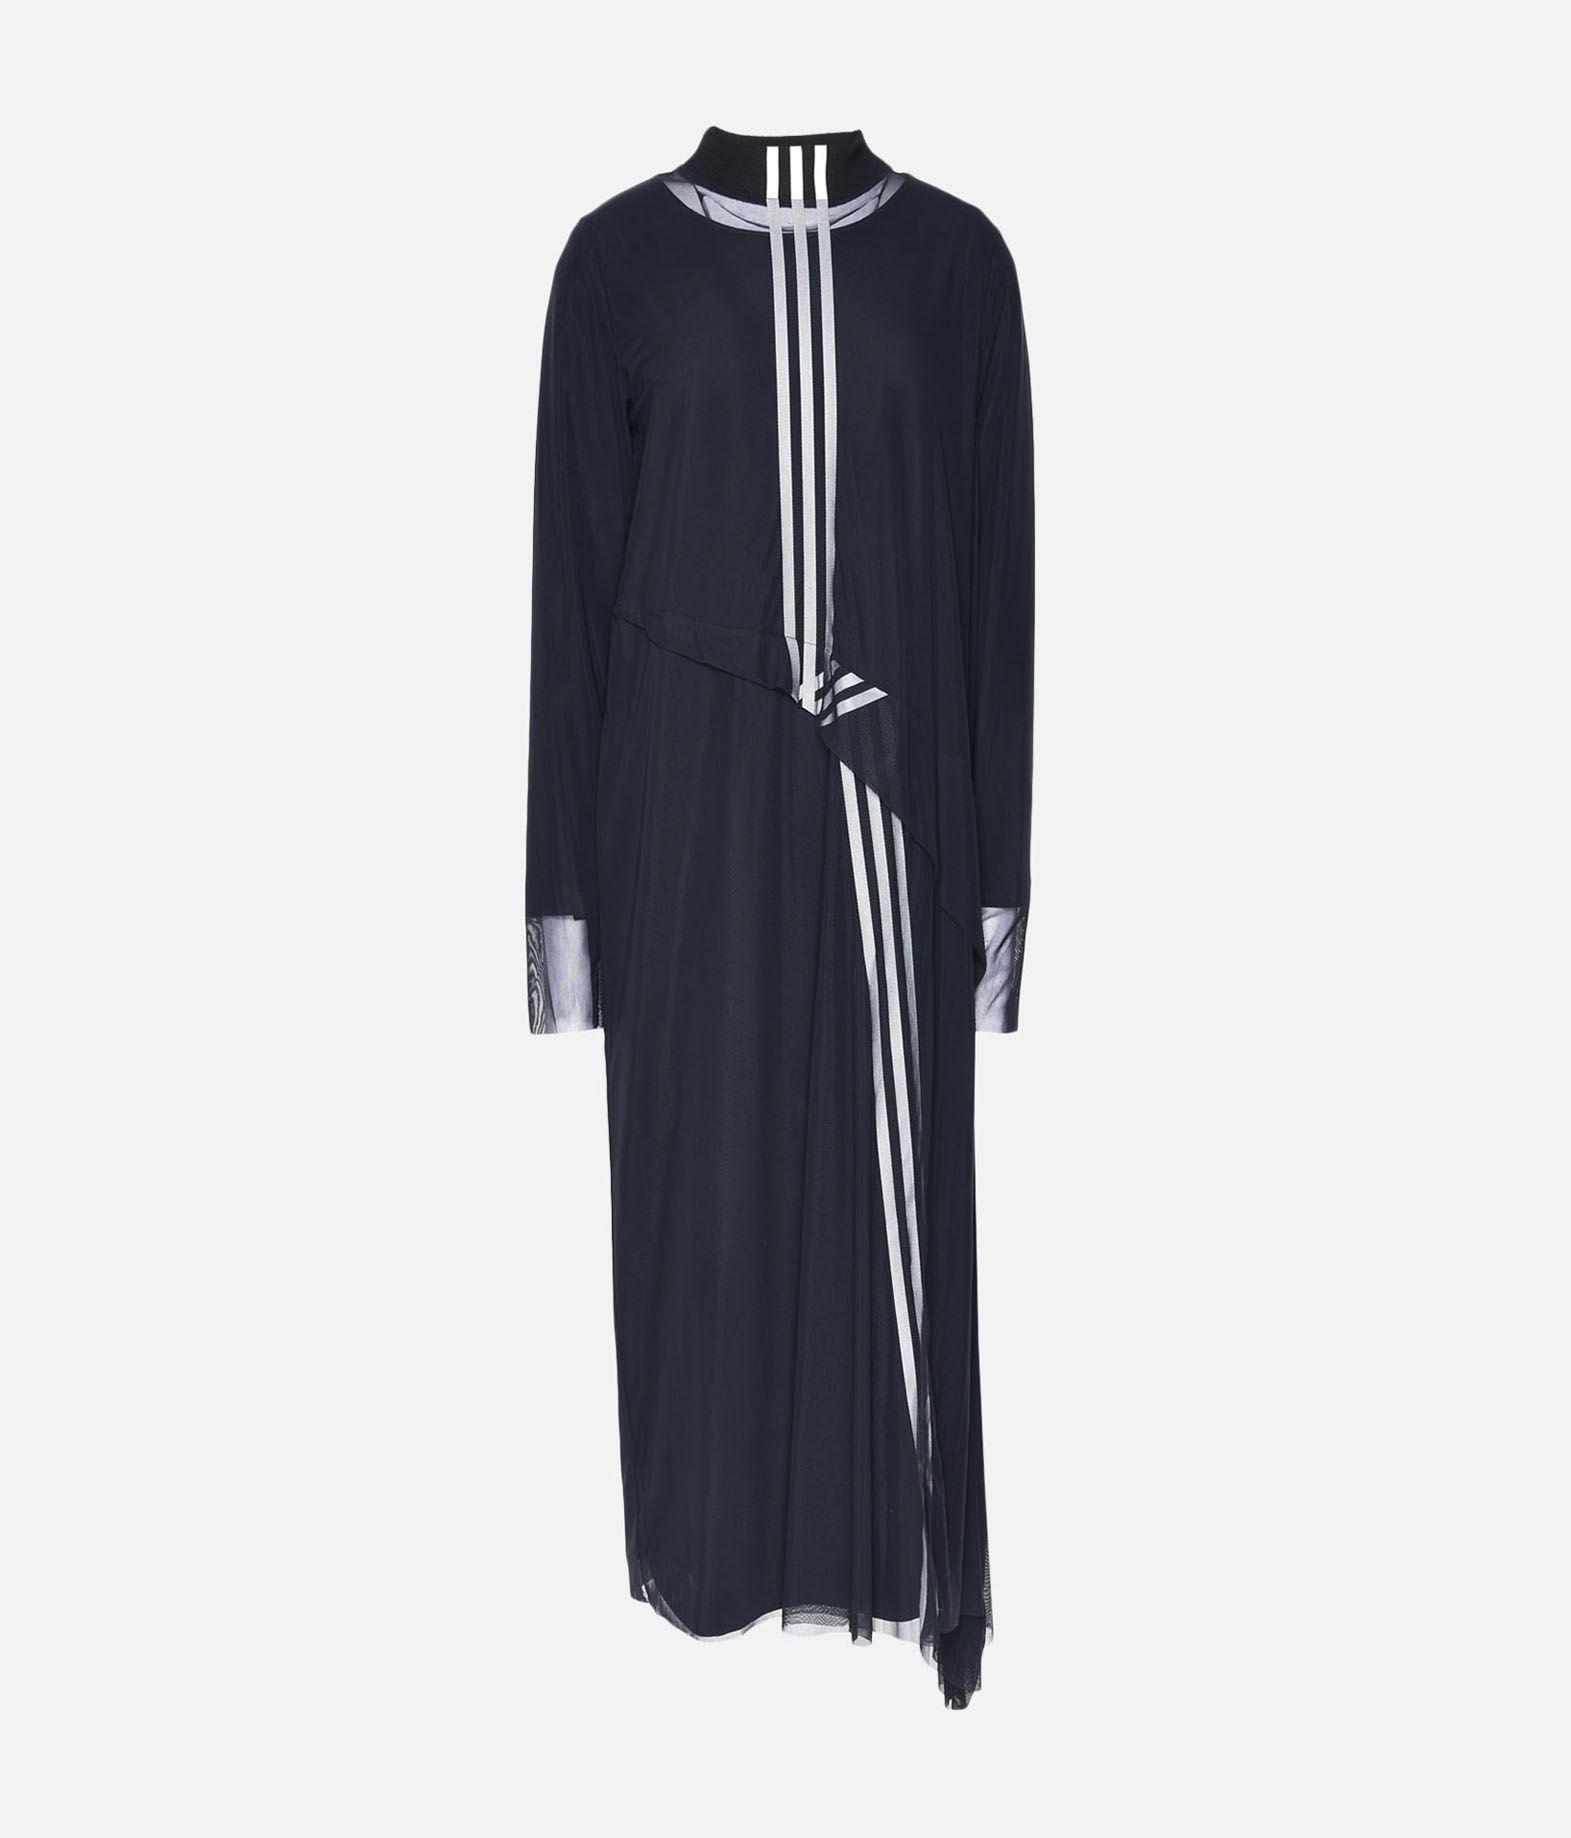 9865769ccb18d ... Y-3 Y-3 3-Stripes Mesh Dress Long dress Woman f ...